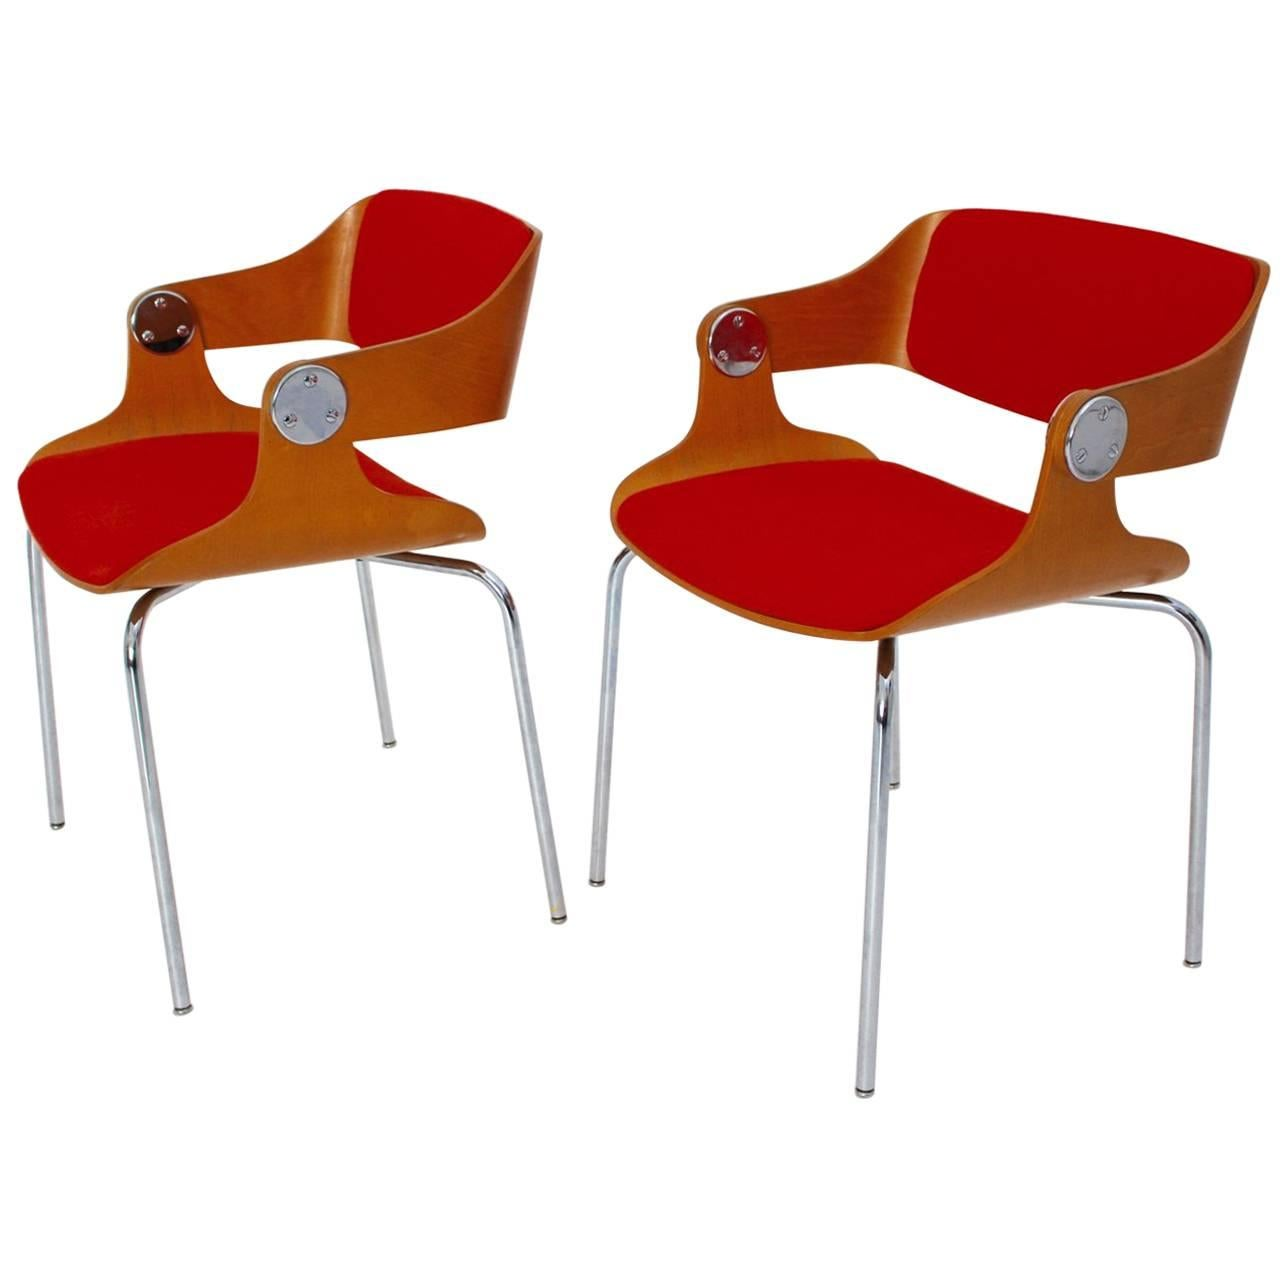 Mid-Century Modern Pair of Orange Armchairs by Eugen Schmidt, 1965, Germany